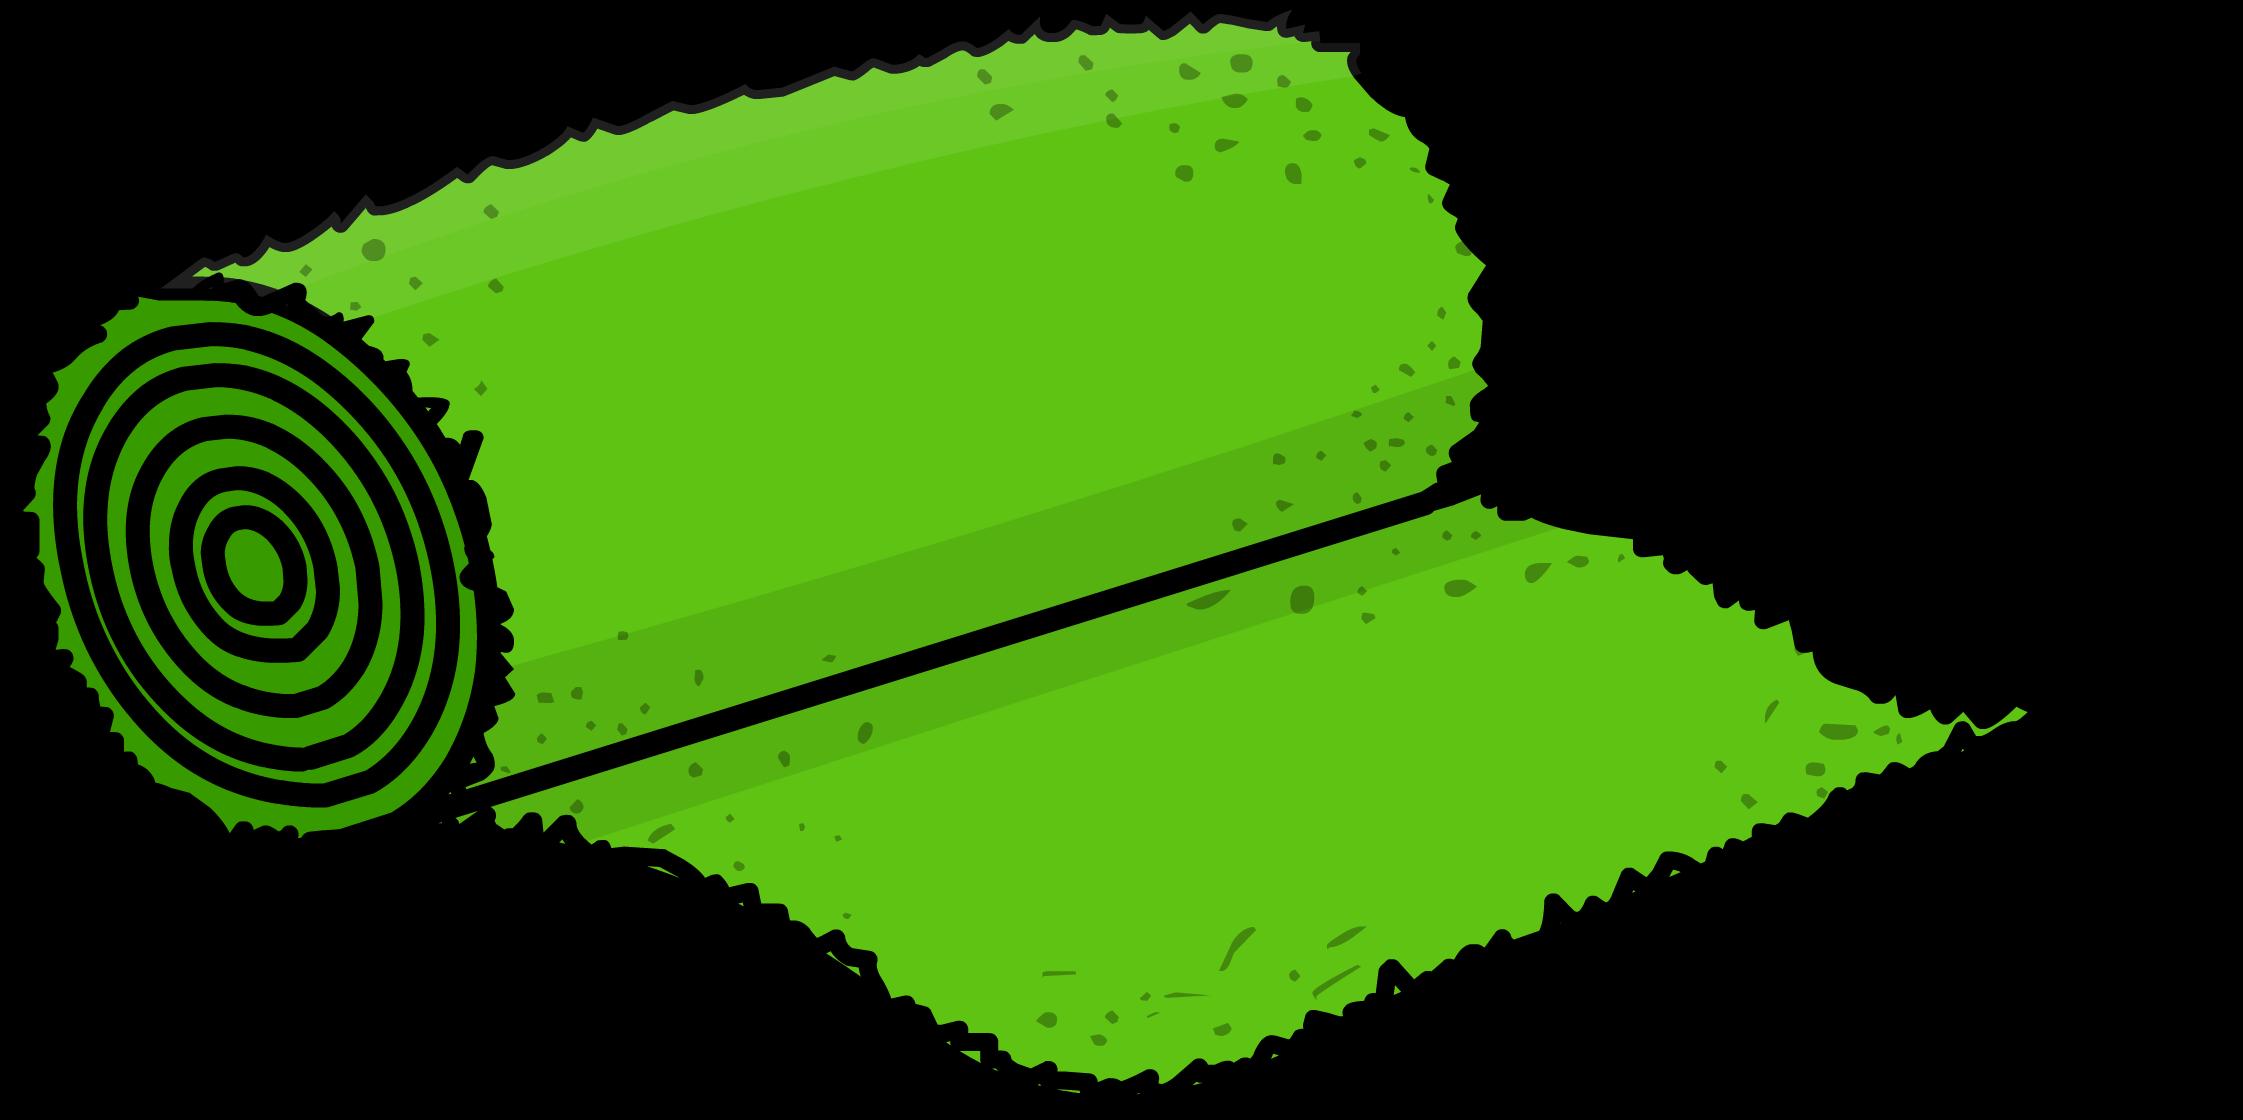 Lime Green Gy Sparkle Carpet Rug 5 X3 Damroo Brand